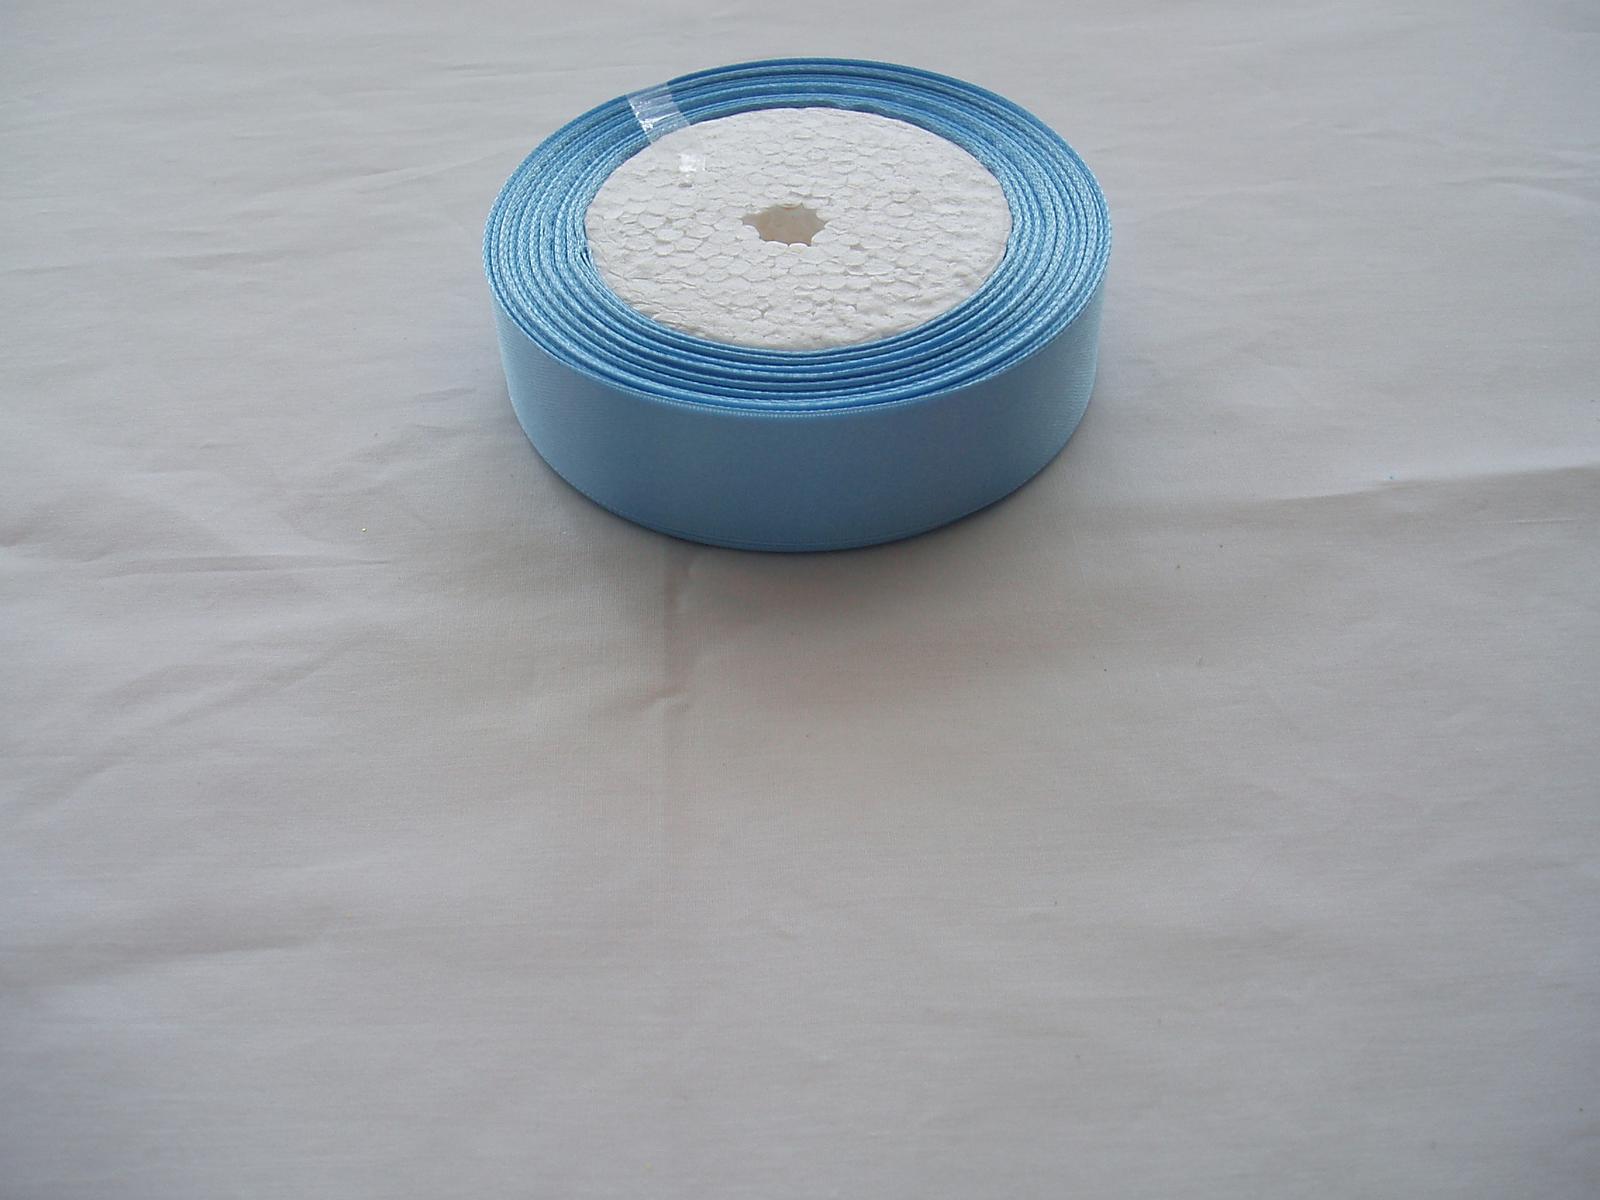 saténová stuha modrá-2 cm - Obrázek č. 1